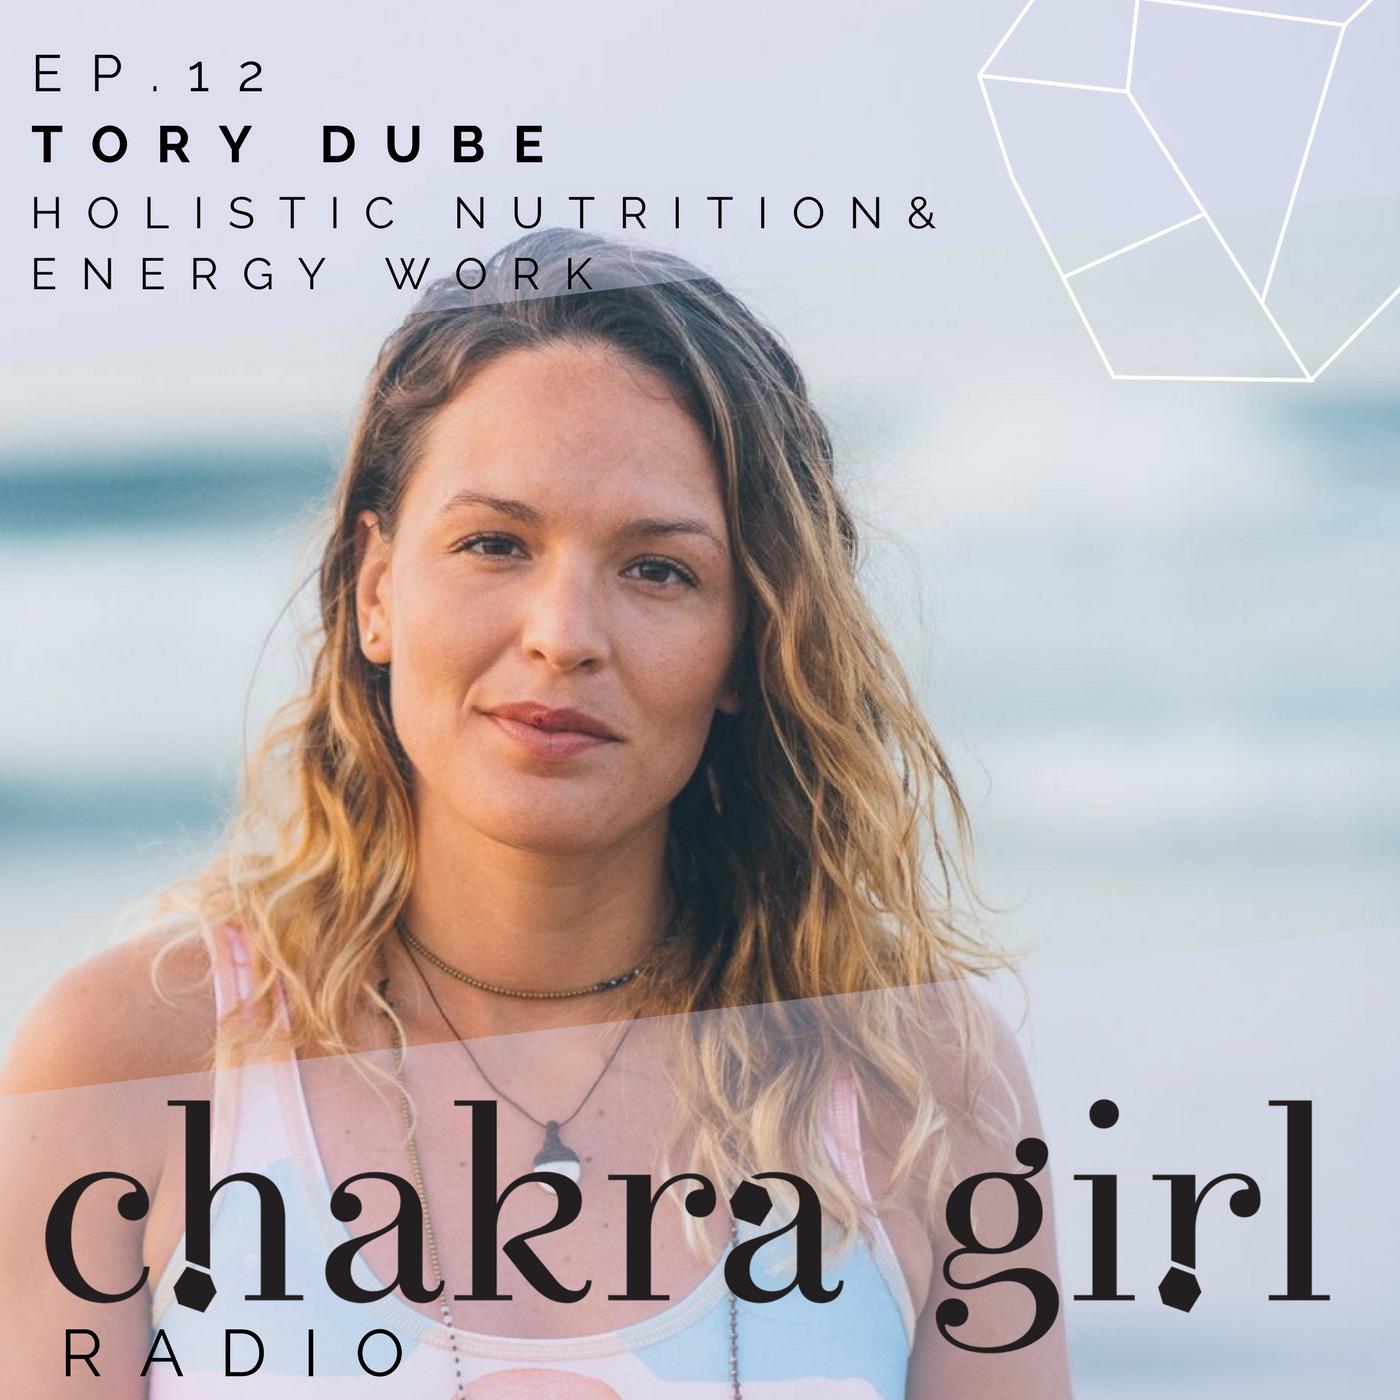 TORY DUBE Chakra Girl Radio.png